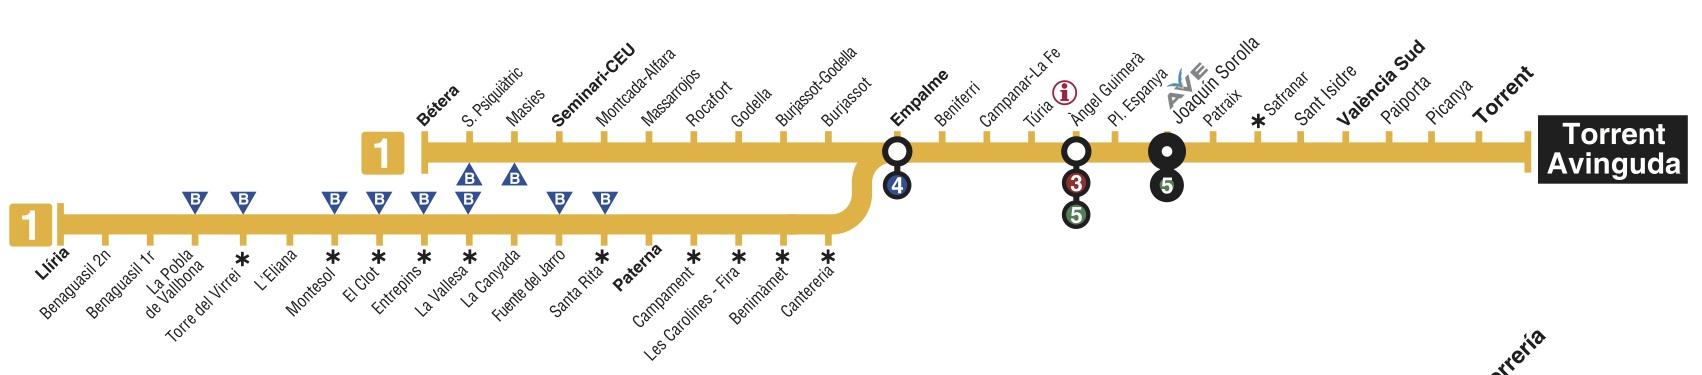 linea de metro de valencia: